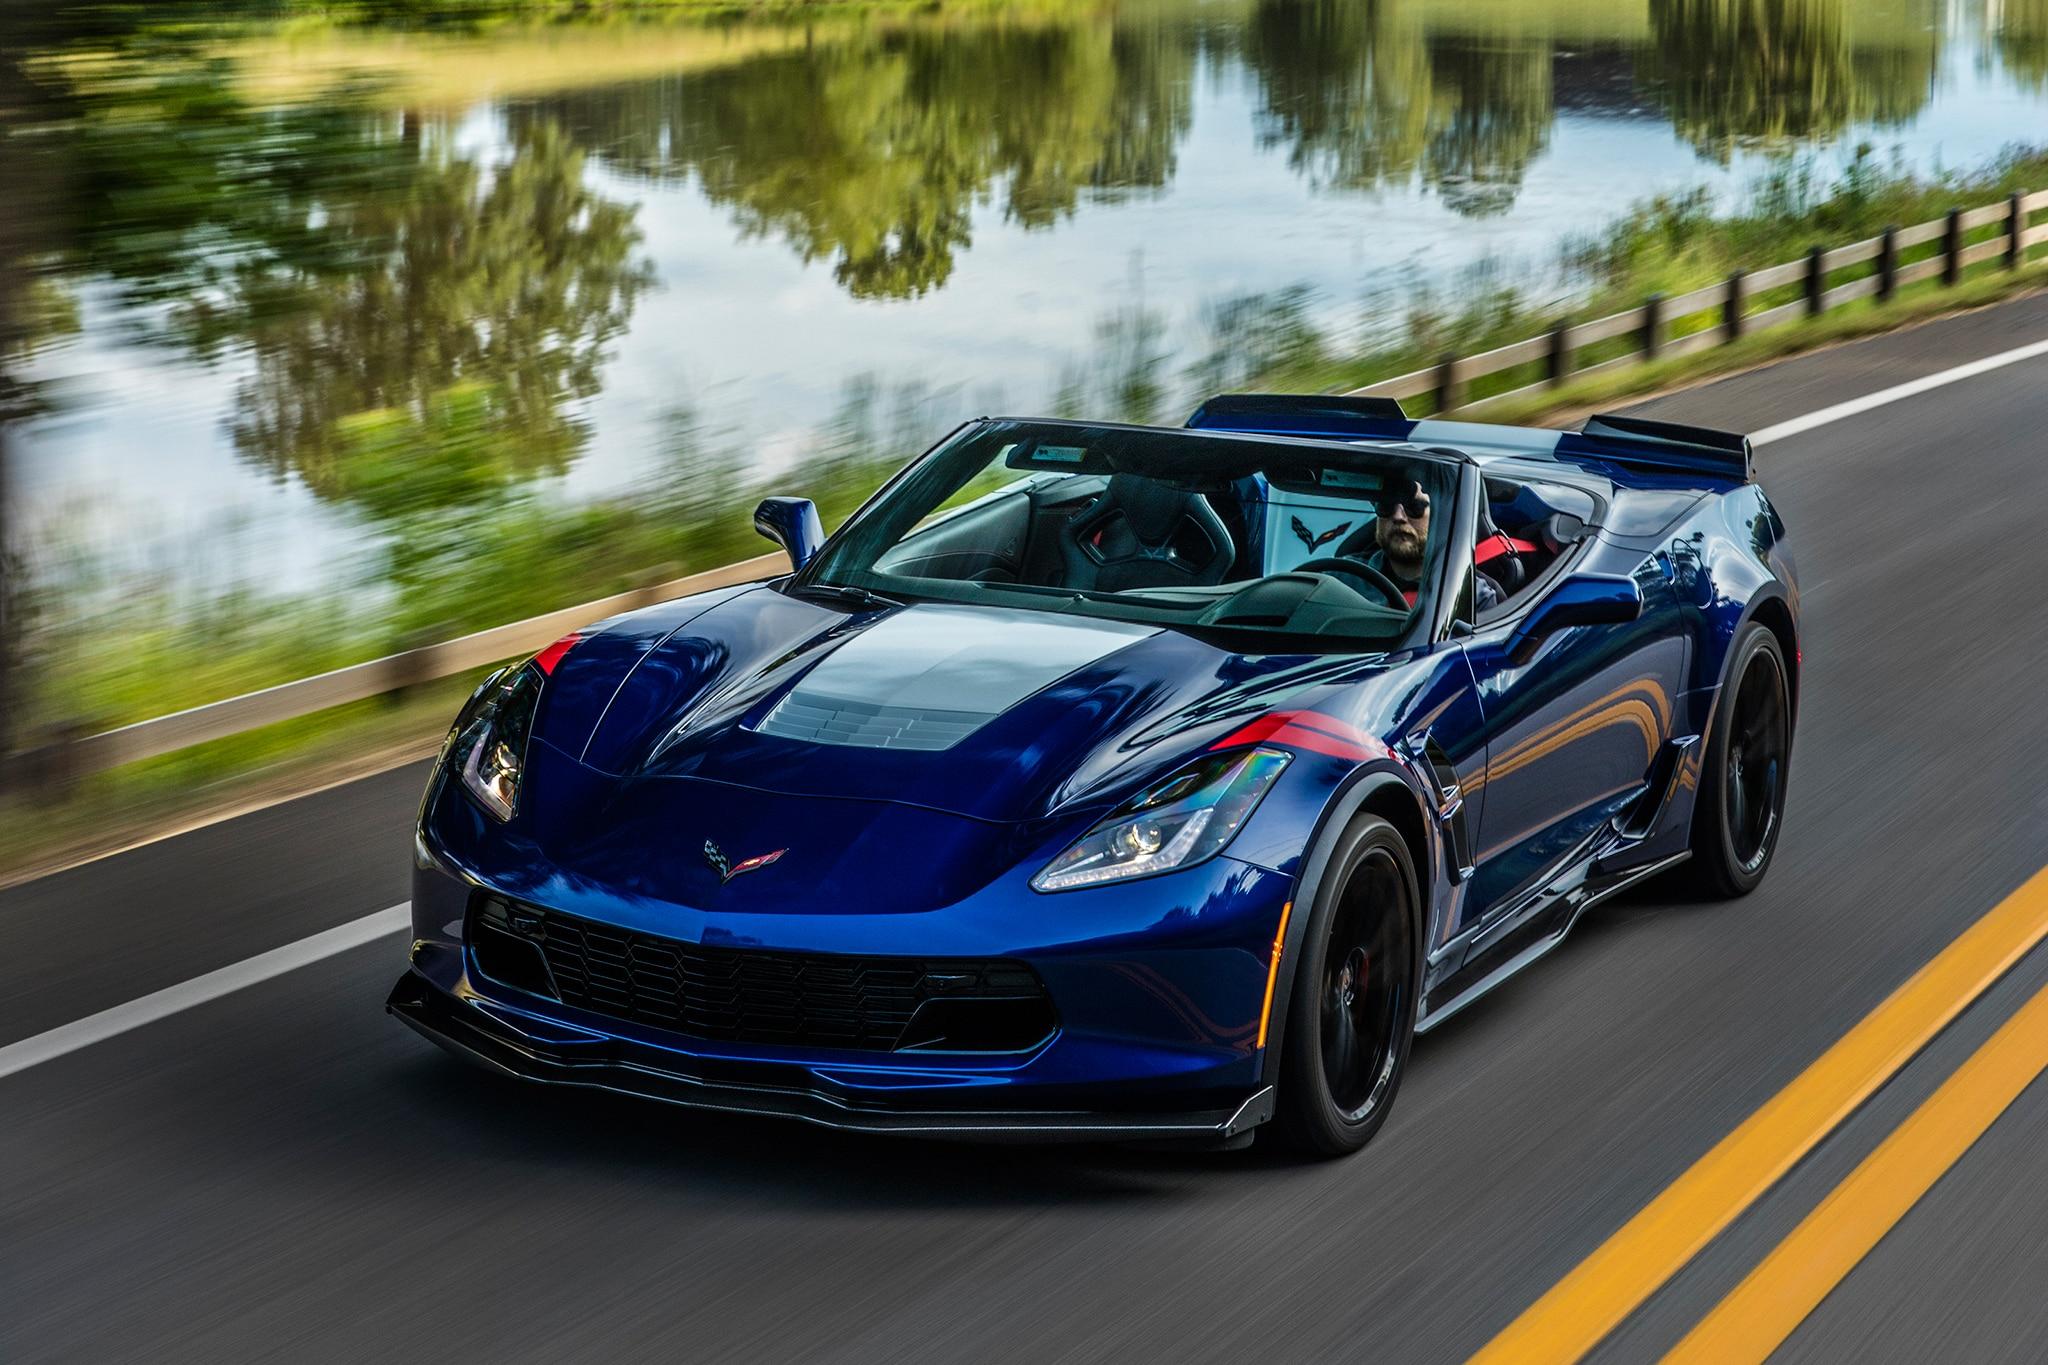 2017 chevrolet corvette grand sport first drive. Black Bedroom Furniture Sets. Home Design Ideas